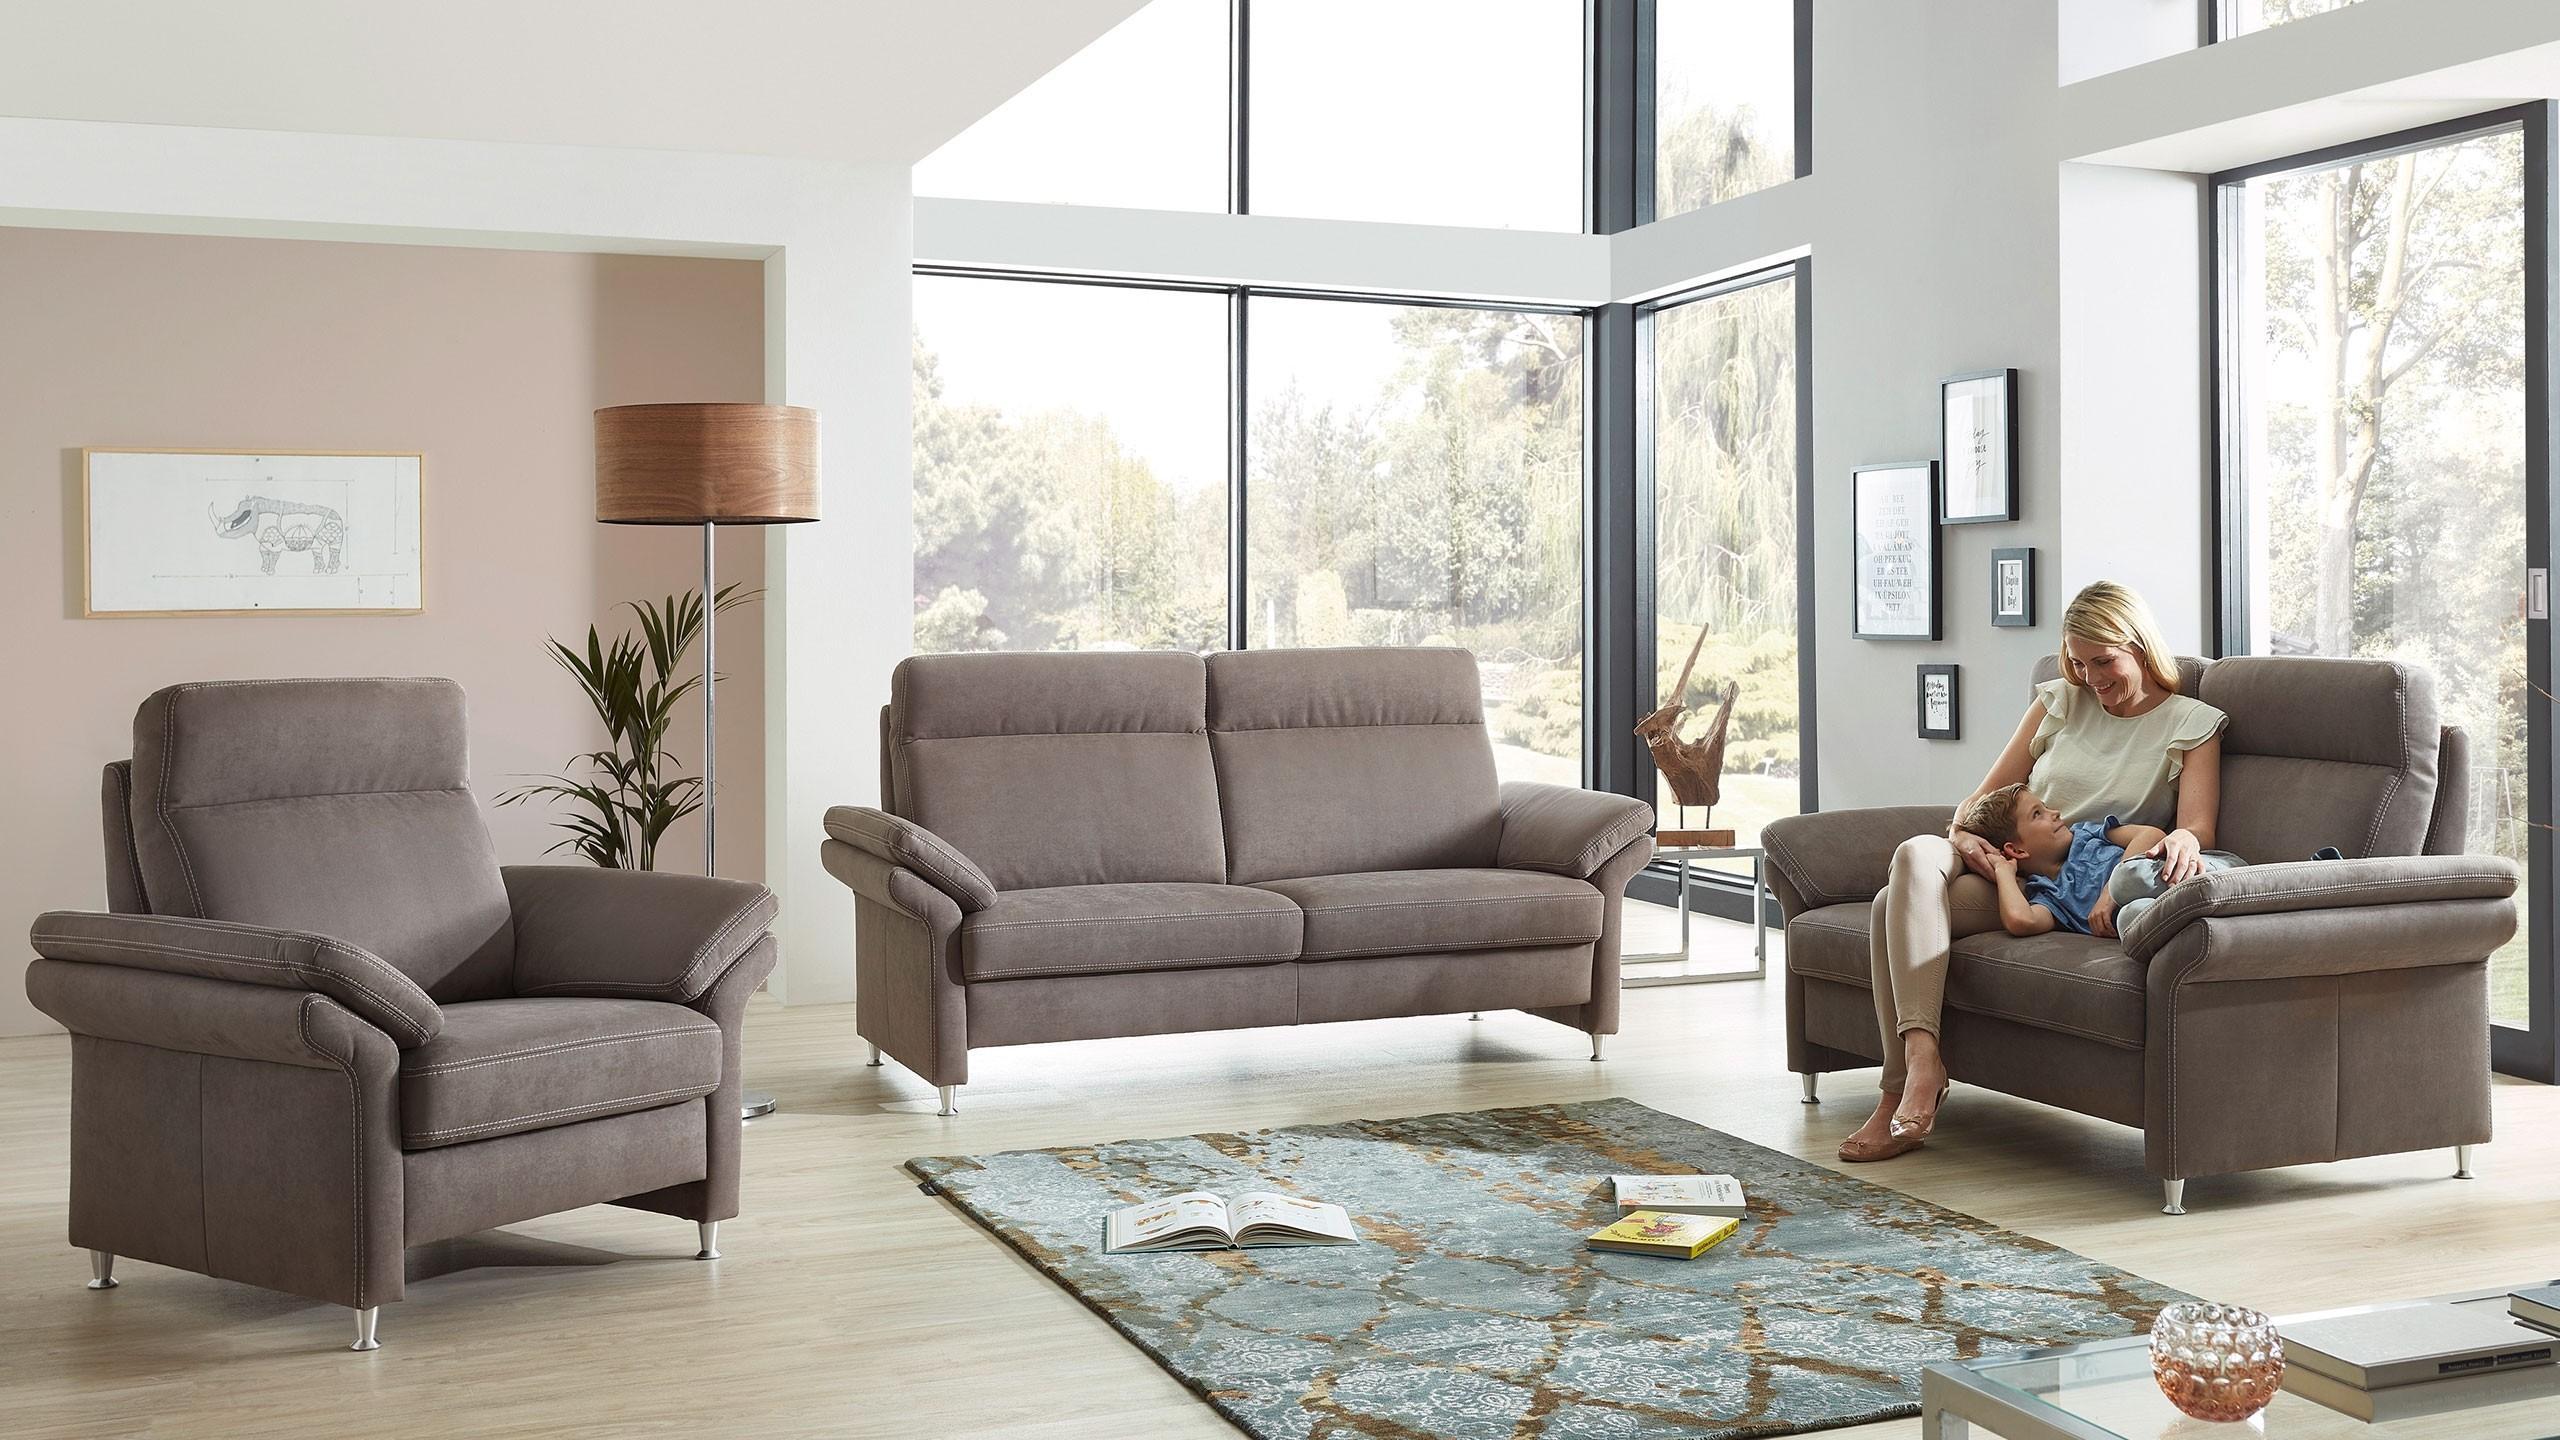 Full Size of Sofa Garnitur 3 Teilig Ikea Kasper Wohndesign Leder Schwarz Couch 2 1 Couchgarnitur Kaufen Garnituren 3 2 Moderne 3 2 1 Sofa Garnitur 3/2/1 Eiche Massivholz Sofa Sofa Garnitur